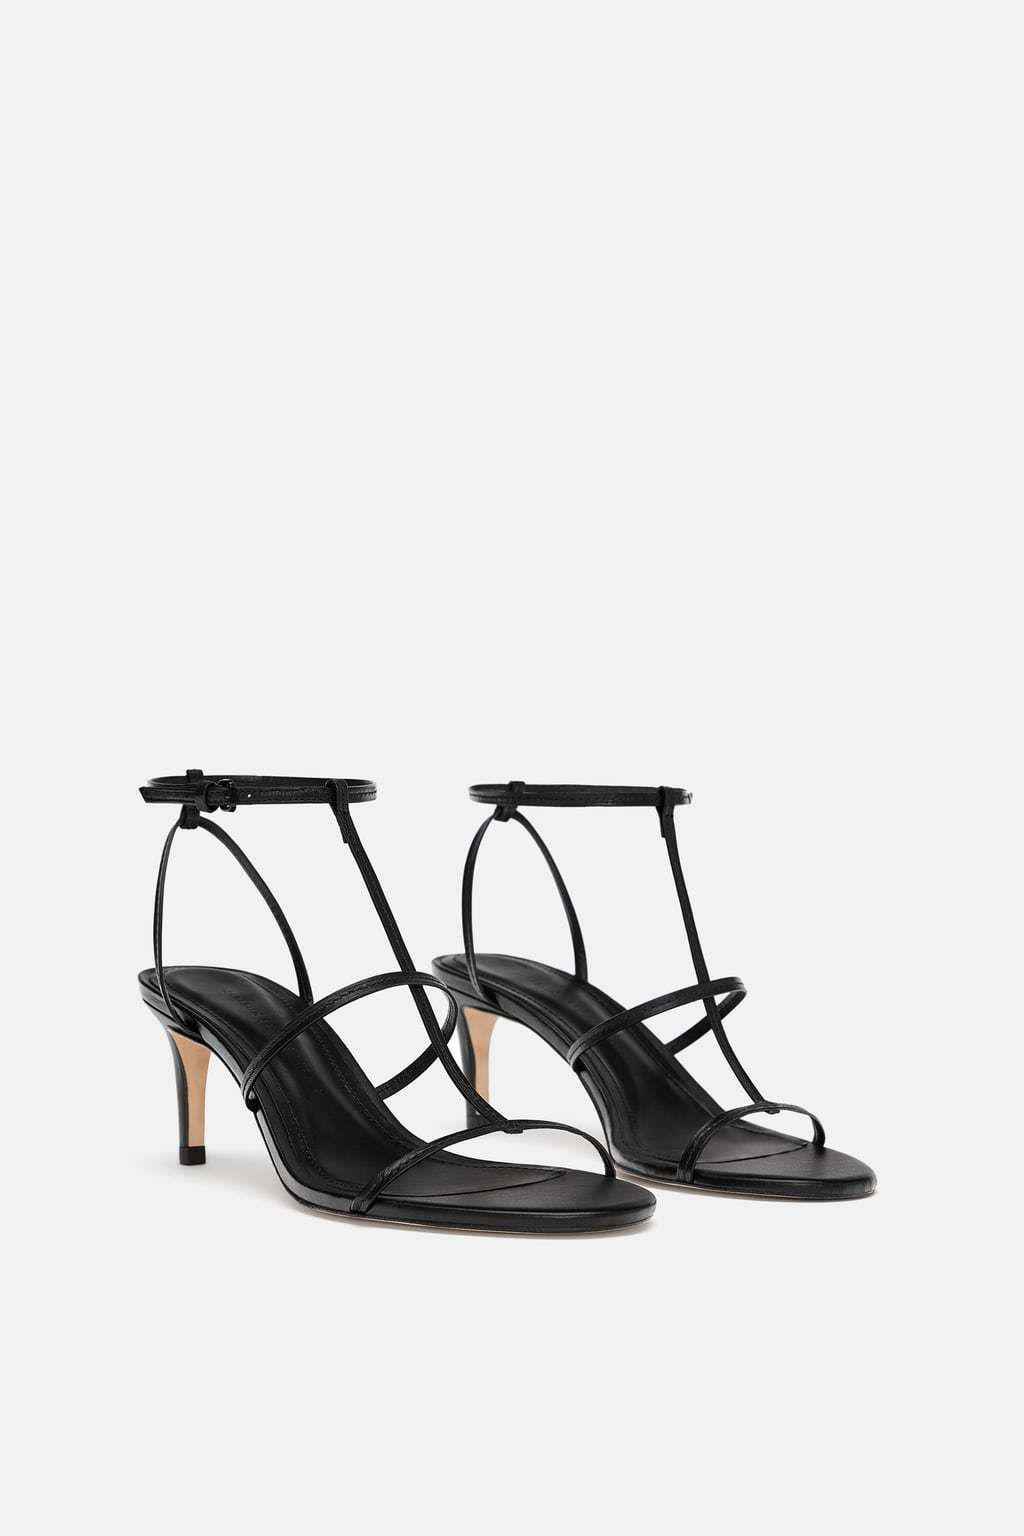 Sandalias en clave minimal, Zara (29,99 euros).